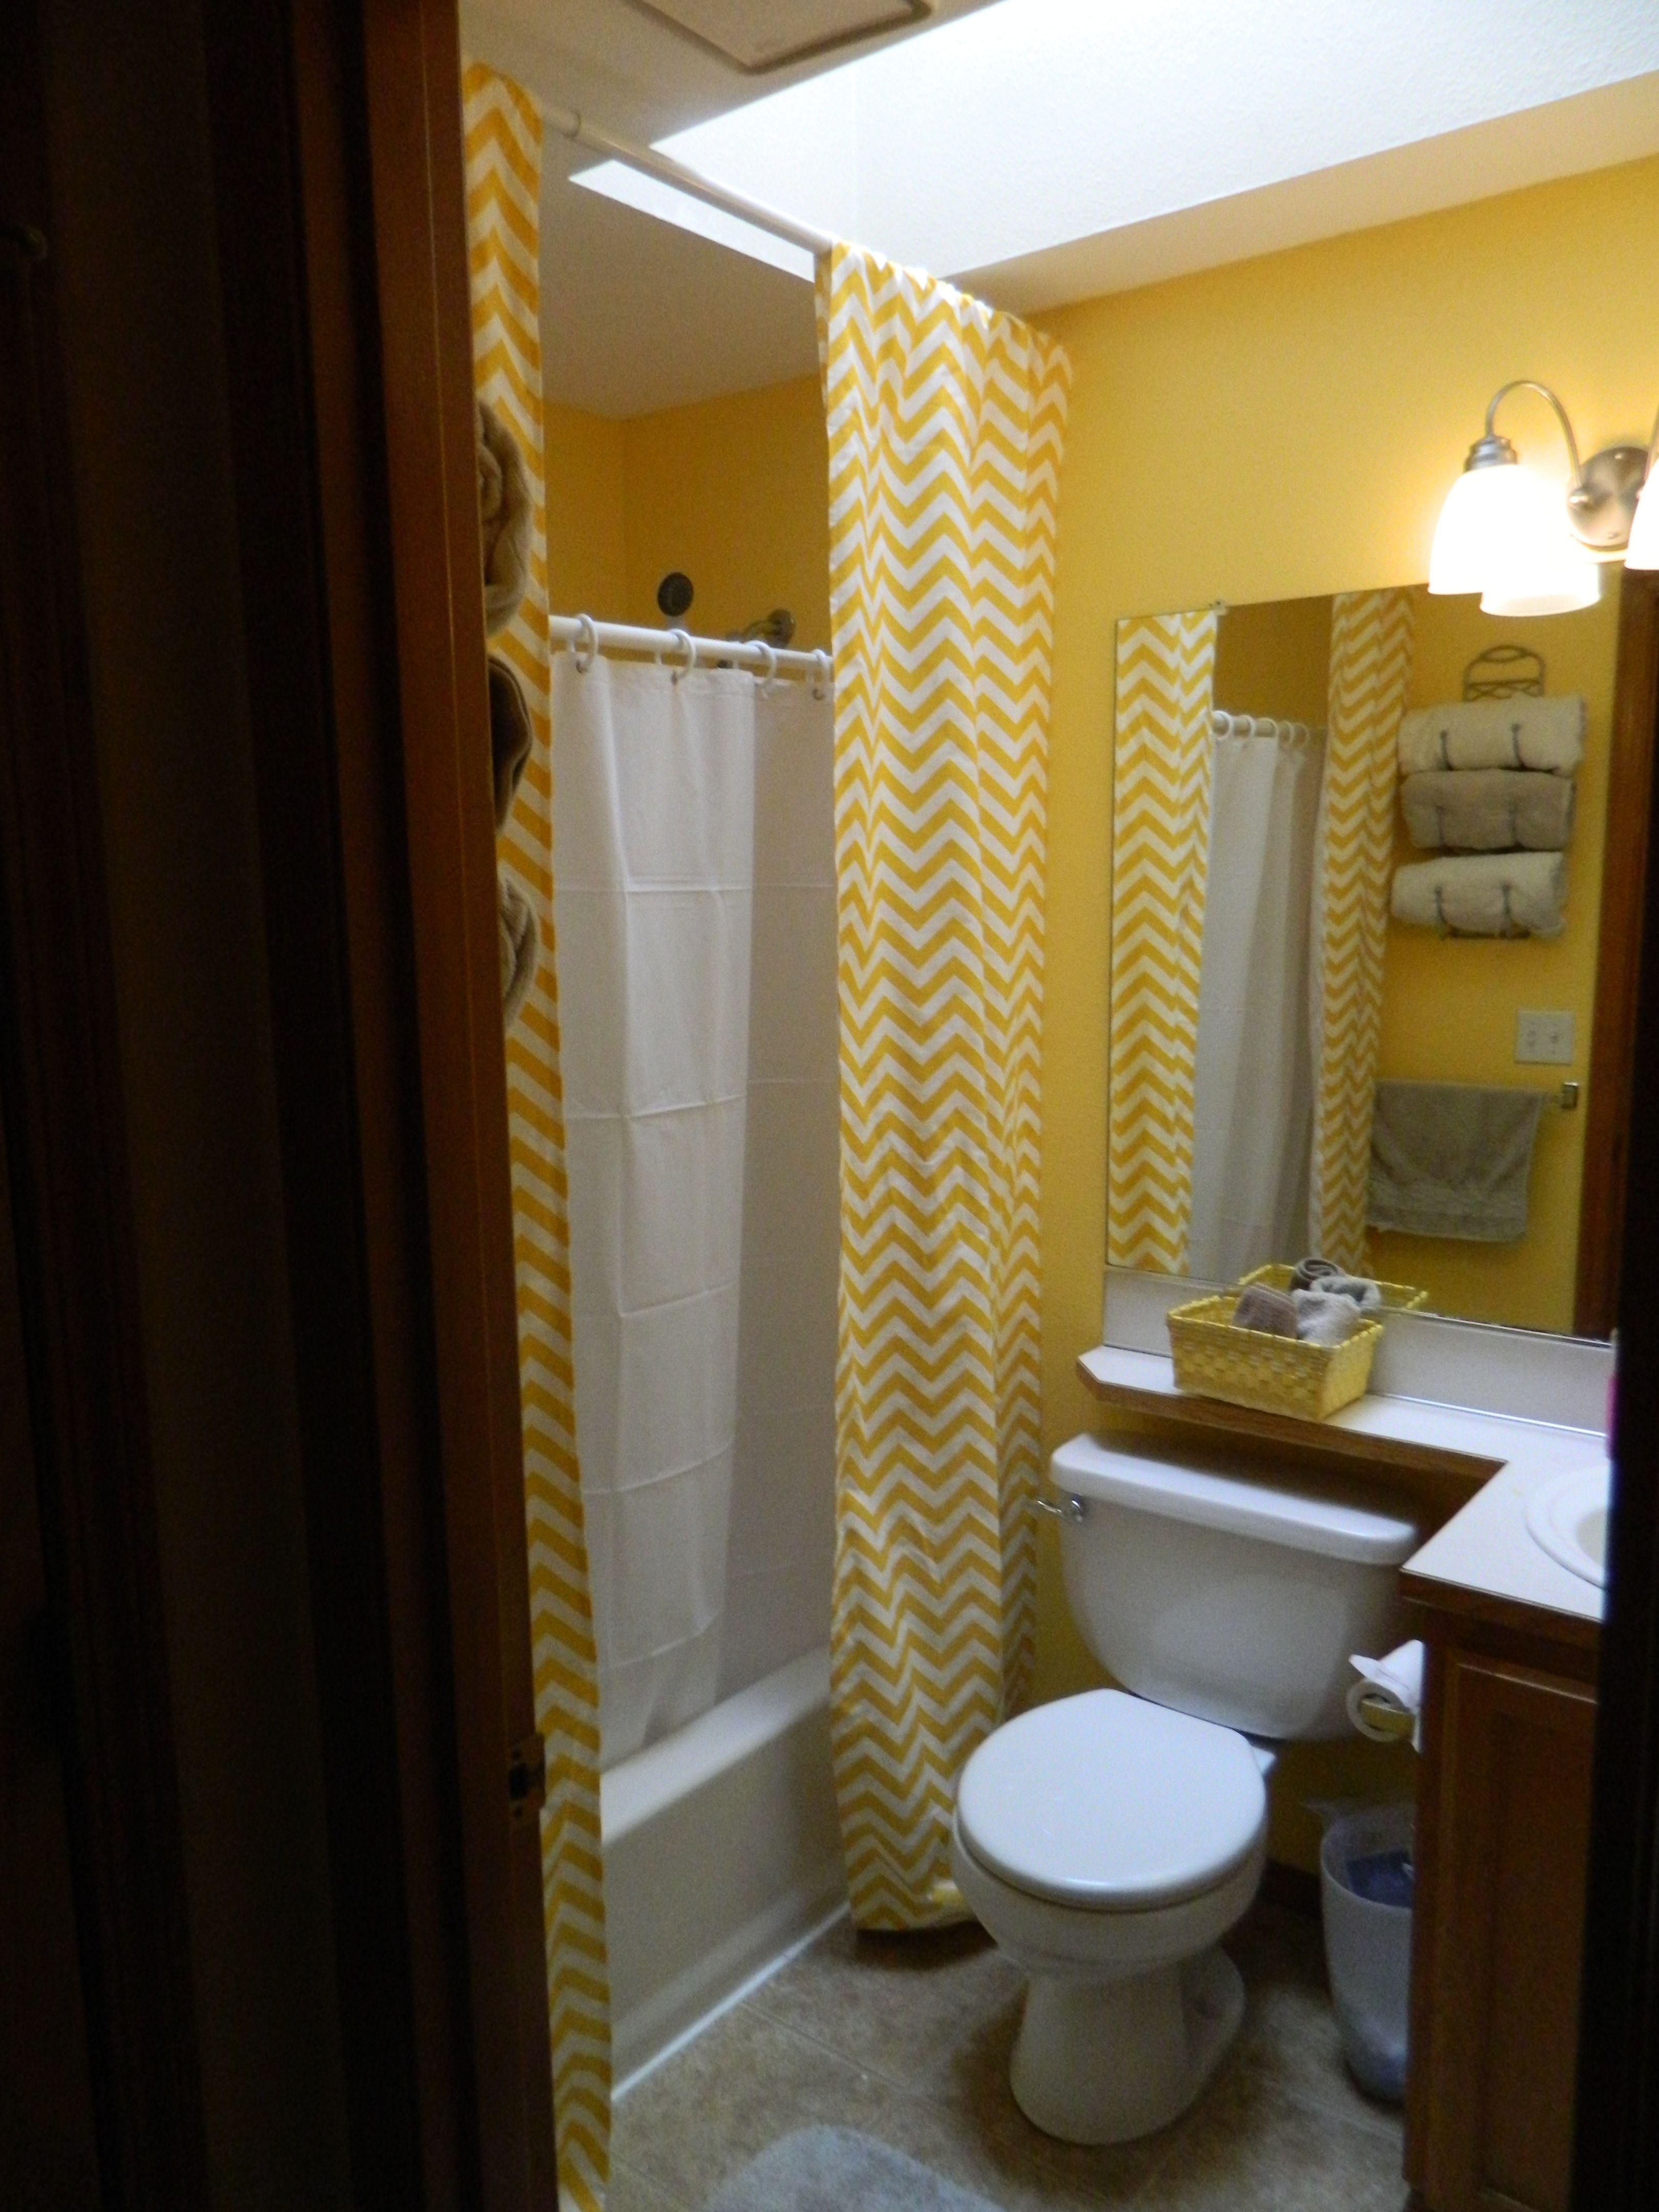 Tall Shower Curtains And Horizontal Lines Plus White Walls Make A Small Bathroom Bigger Farmhouse Renovation